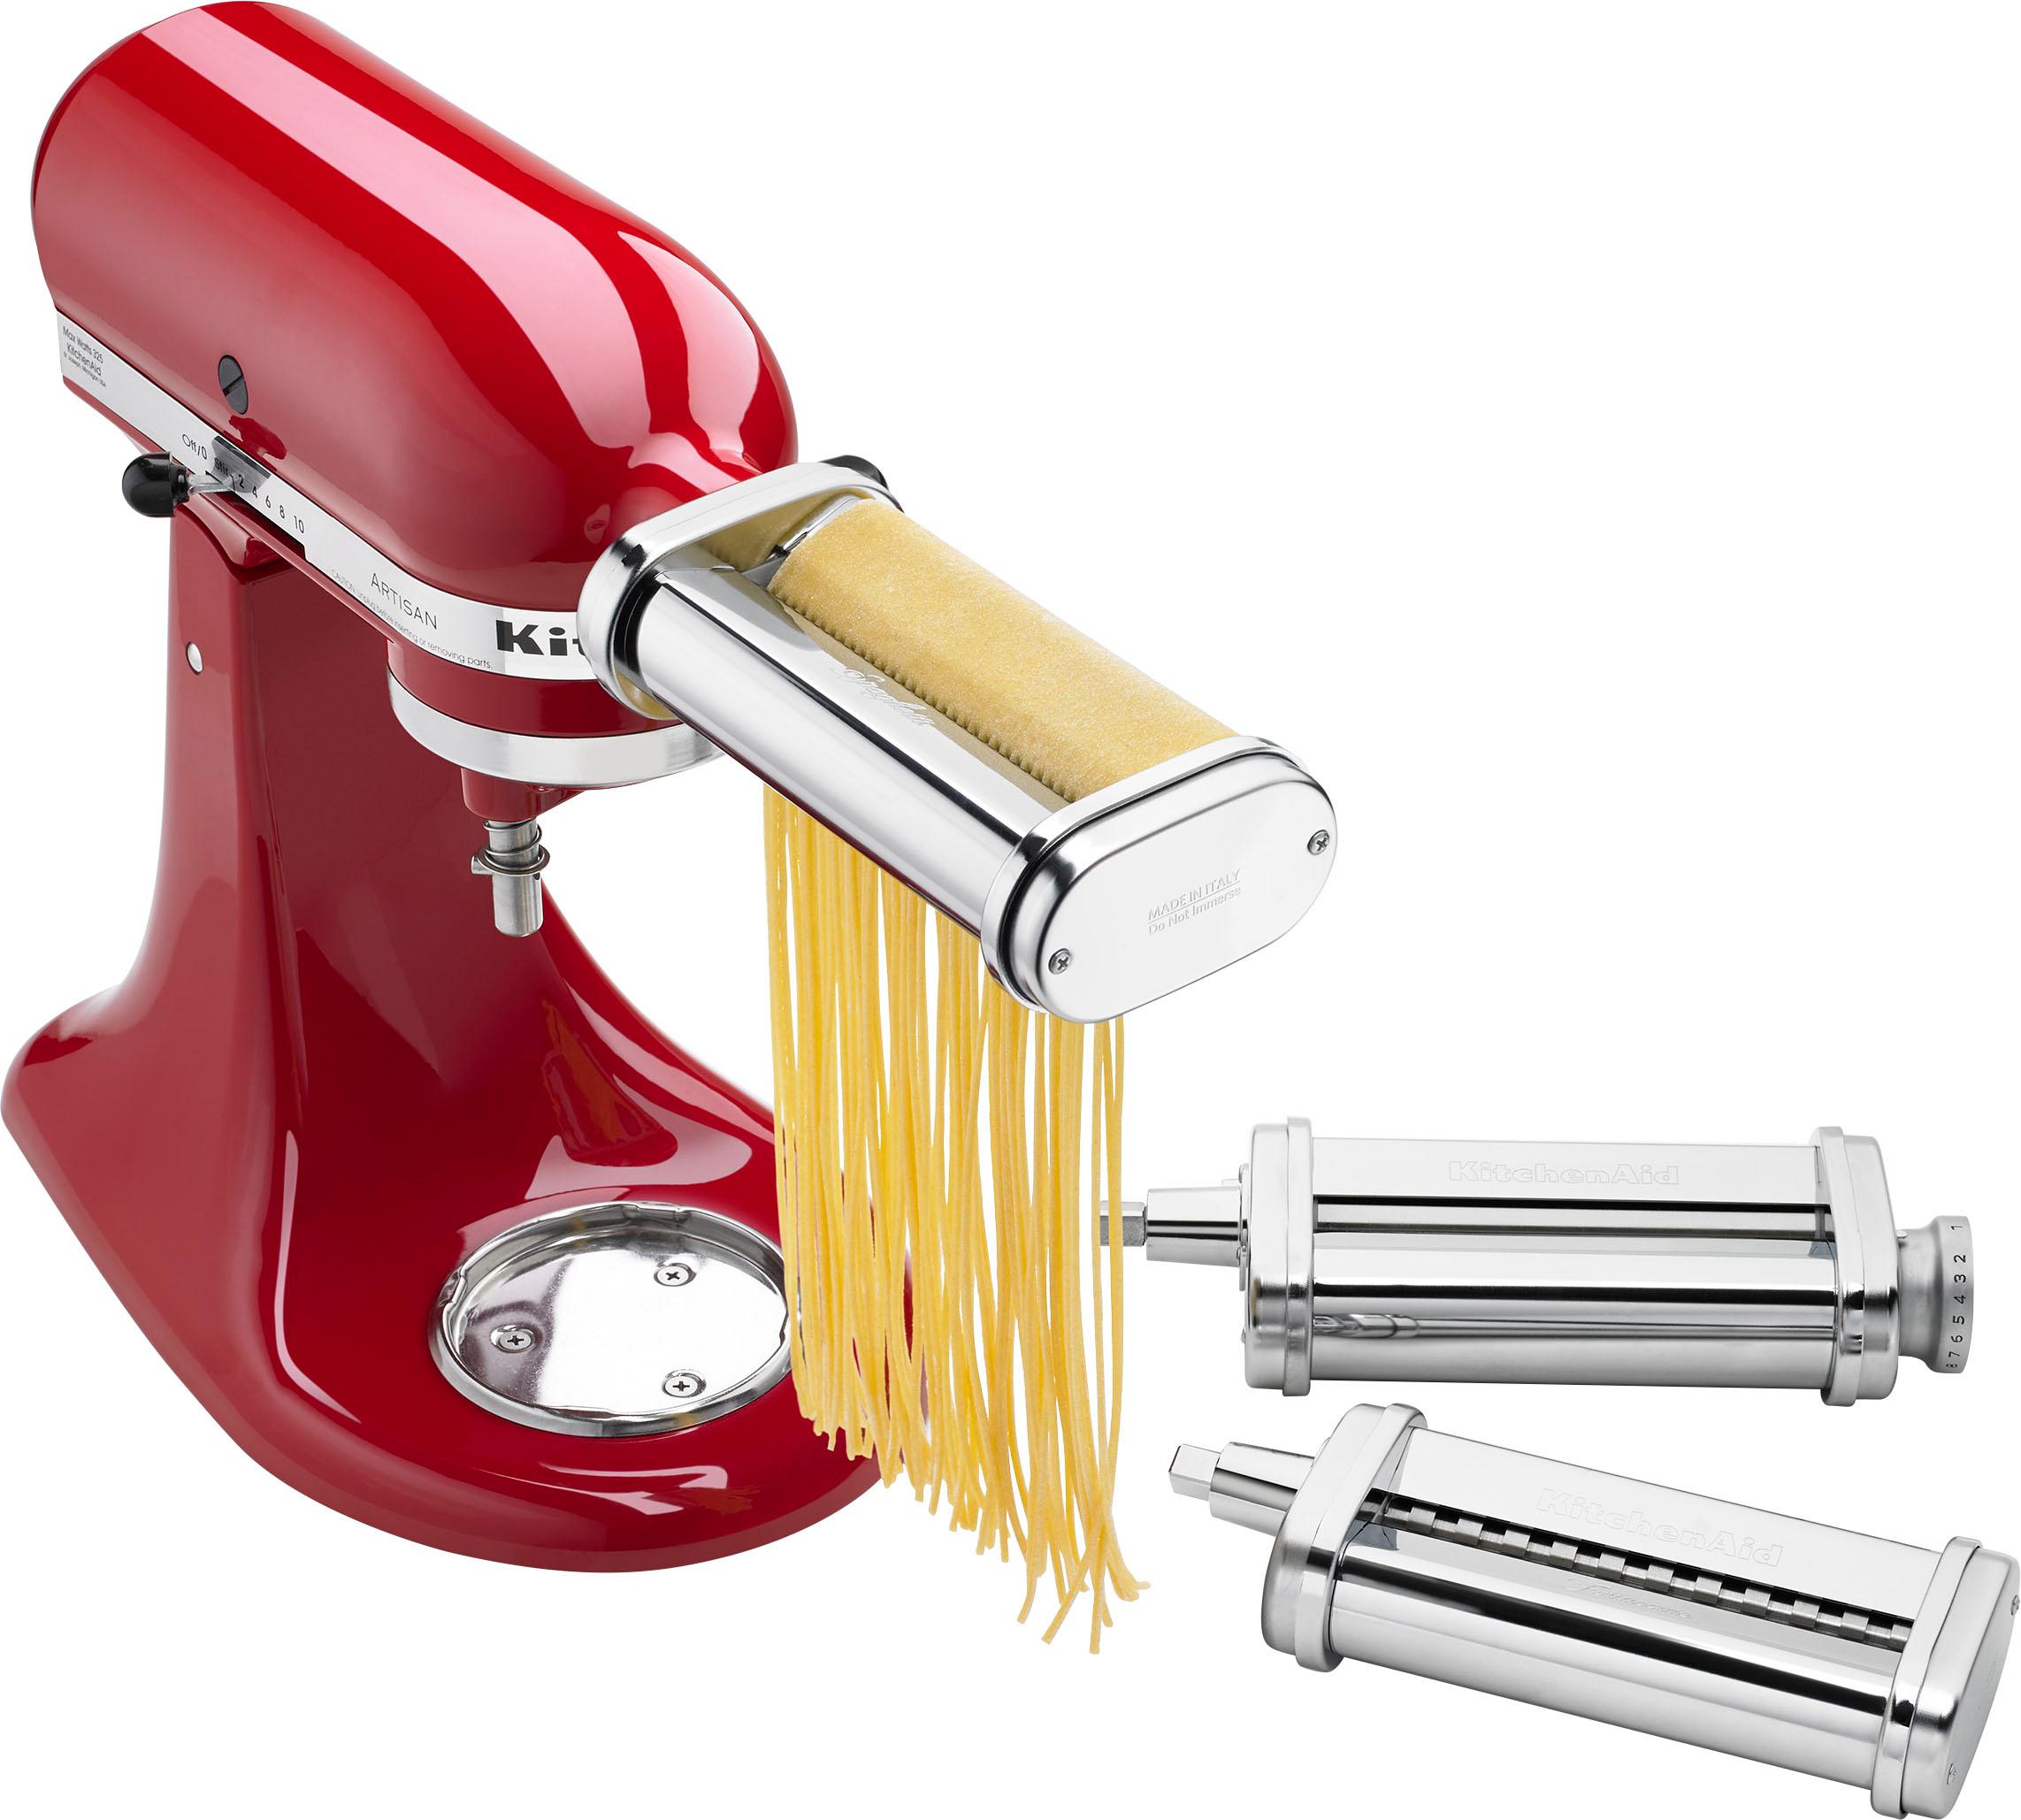 kitchen aid pro 500 stainless steel cabinets kitchenaid kv25g0xsl professional series stand mixer